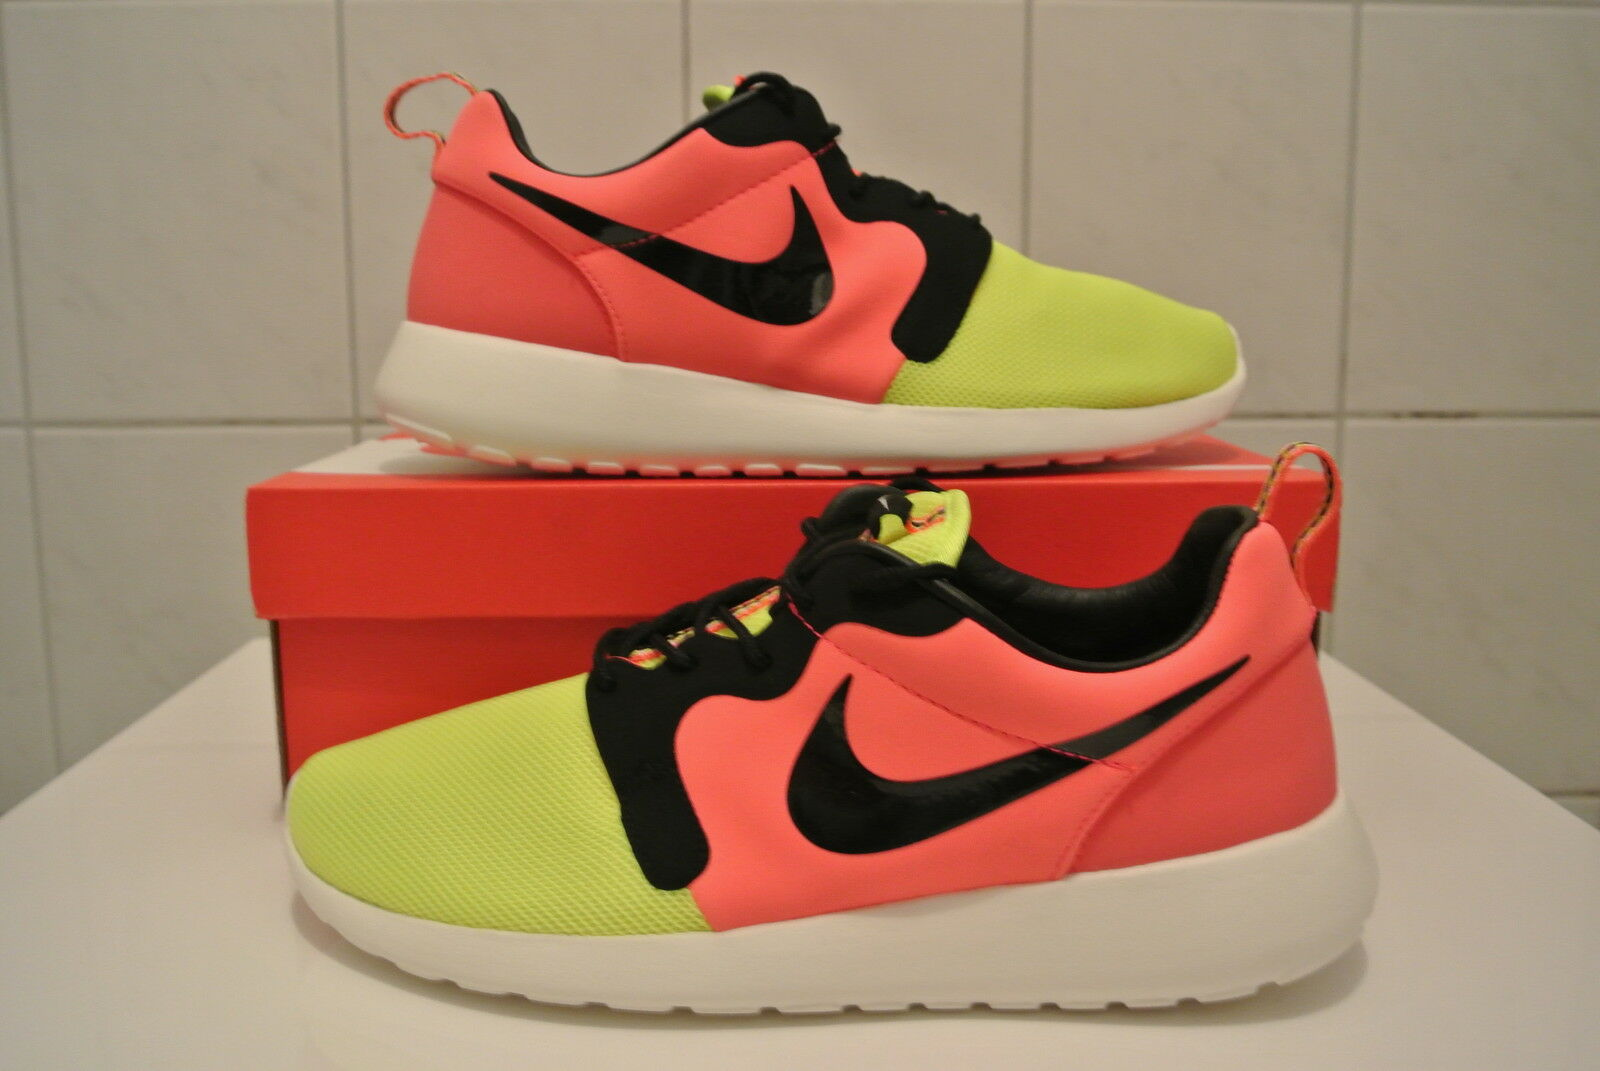 Nike Rosherun HYP PRM QS Neu & OVP 669689 700